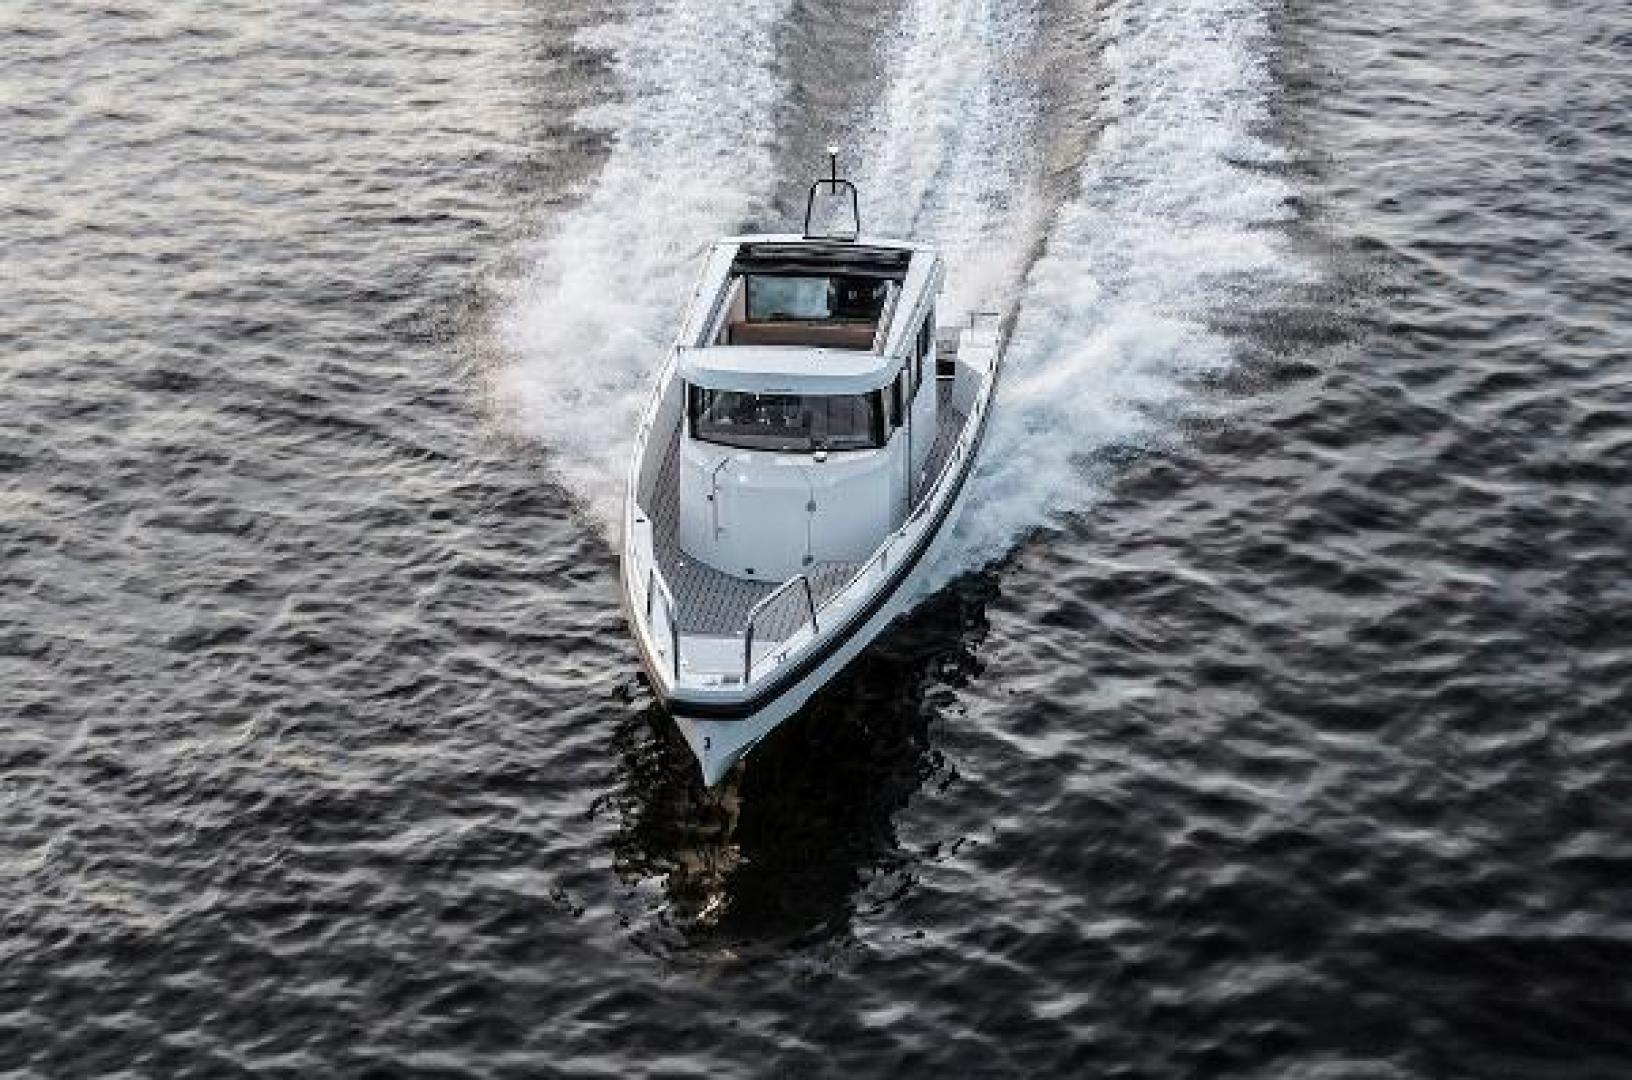 Axopar-28 CABIN 2021-Axopar 28 CABIN Tampa Bay-Florida-United States-1531504 | Thumbnail